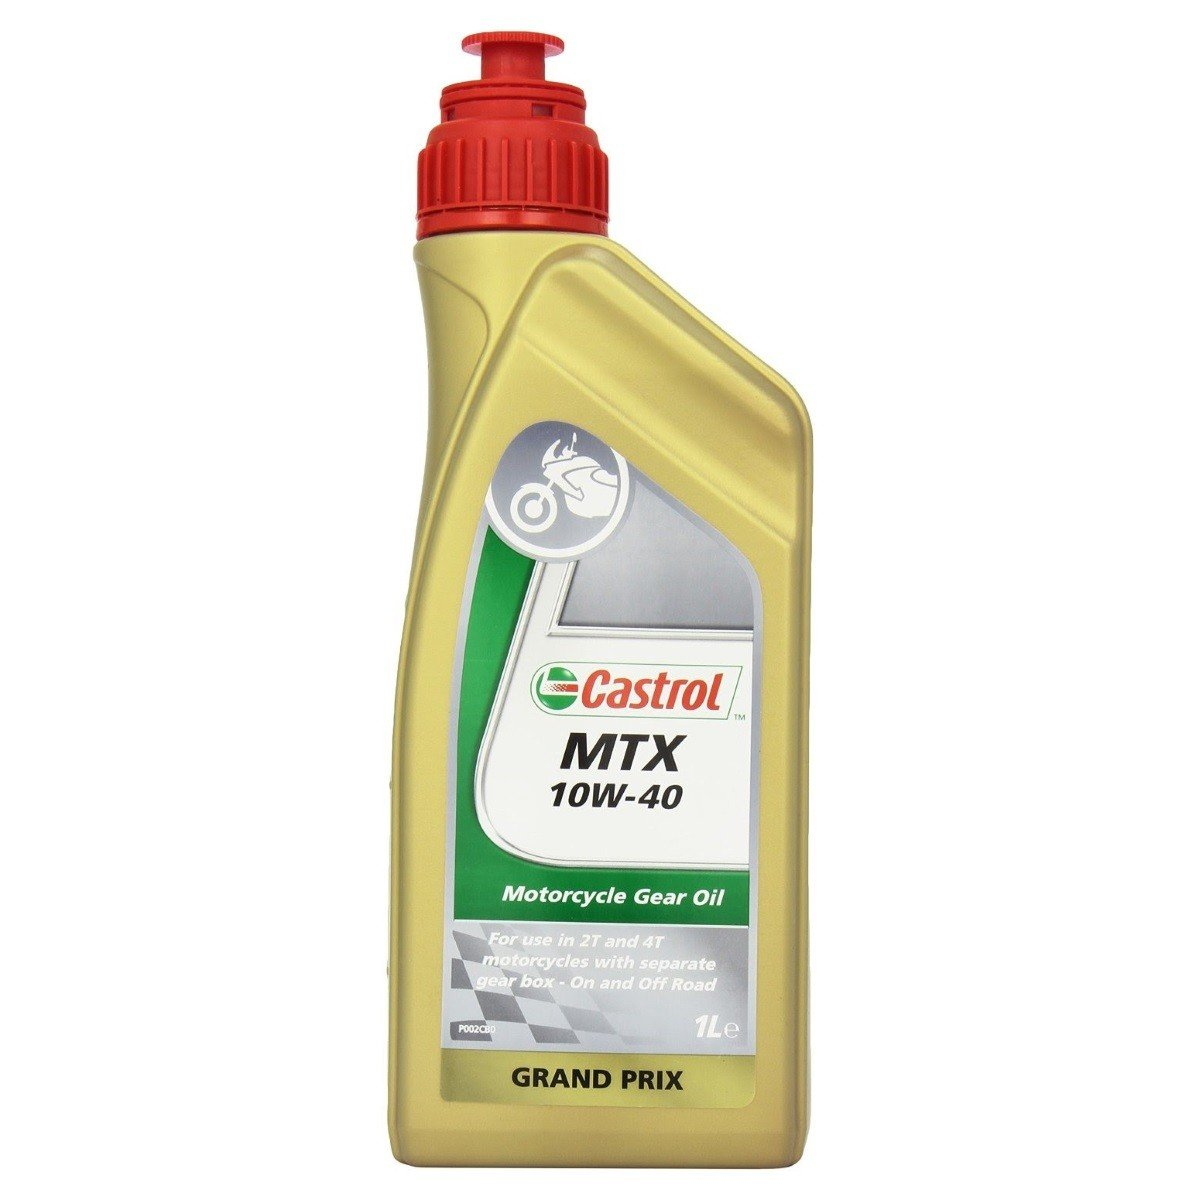 Castrol MTX 10W-40 1L